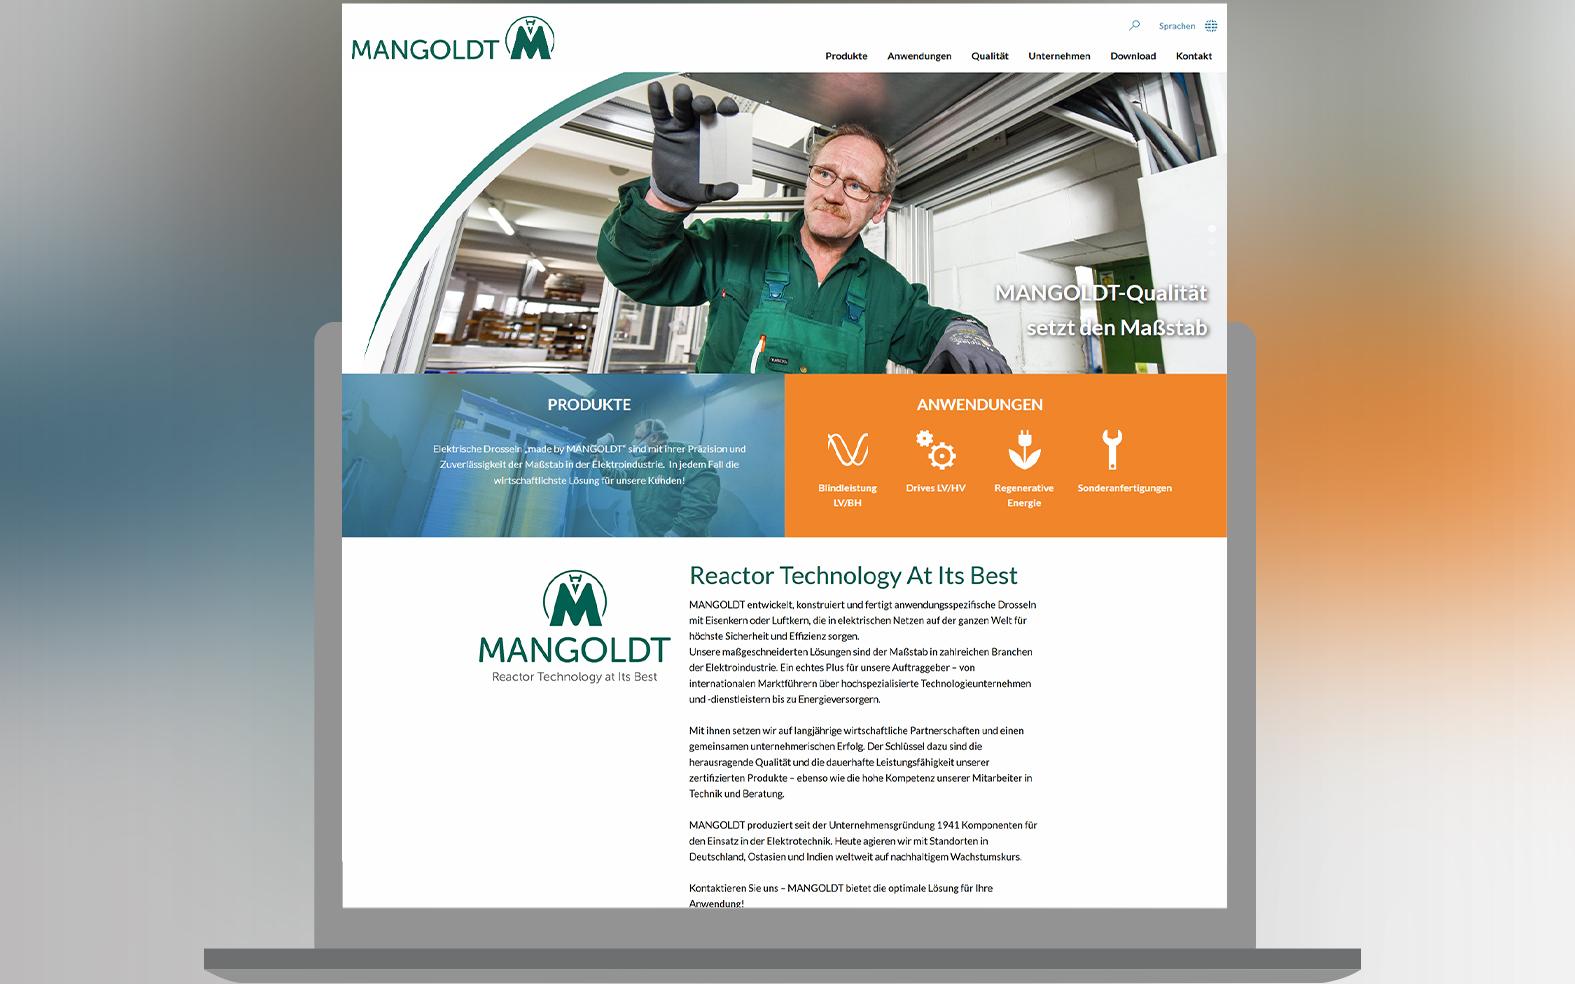 Mangoldt Webseite